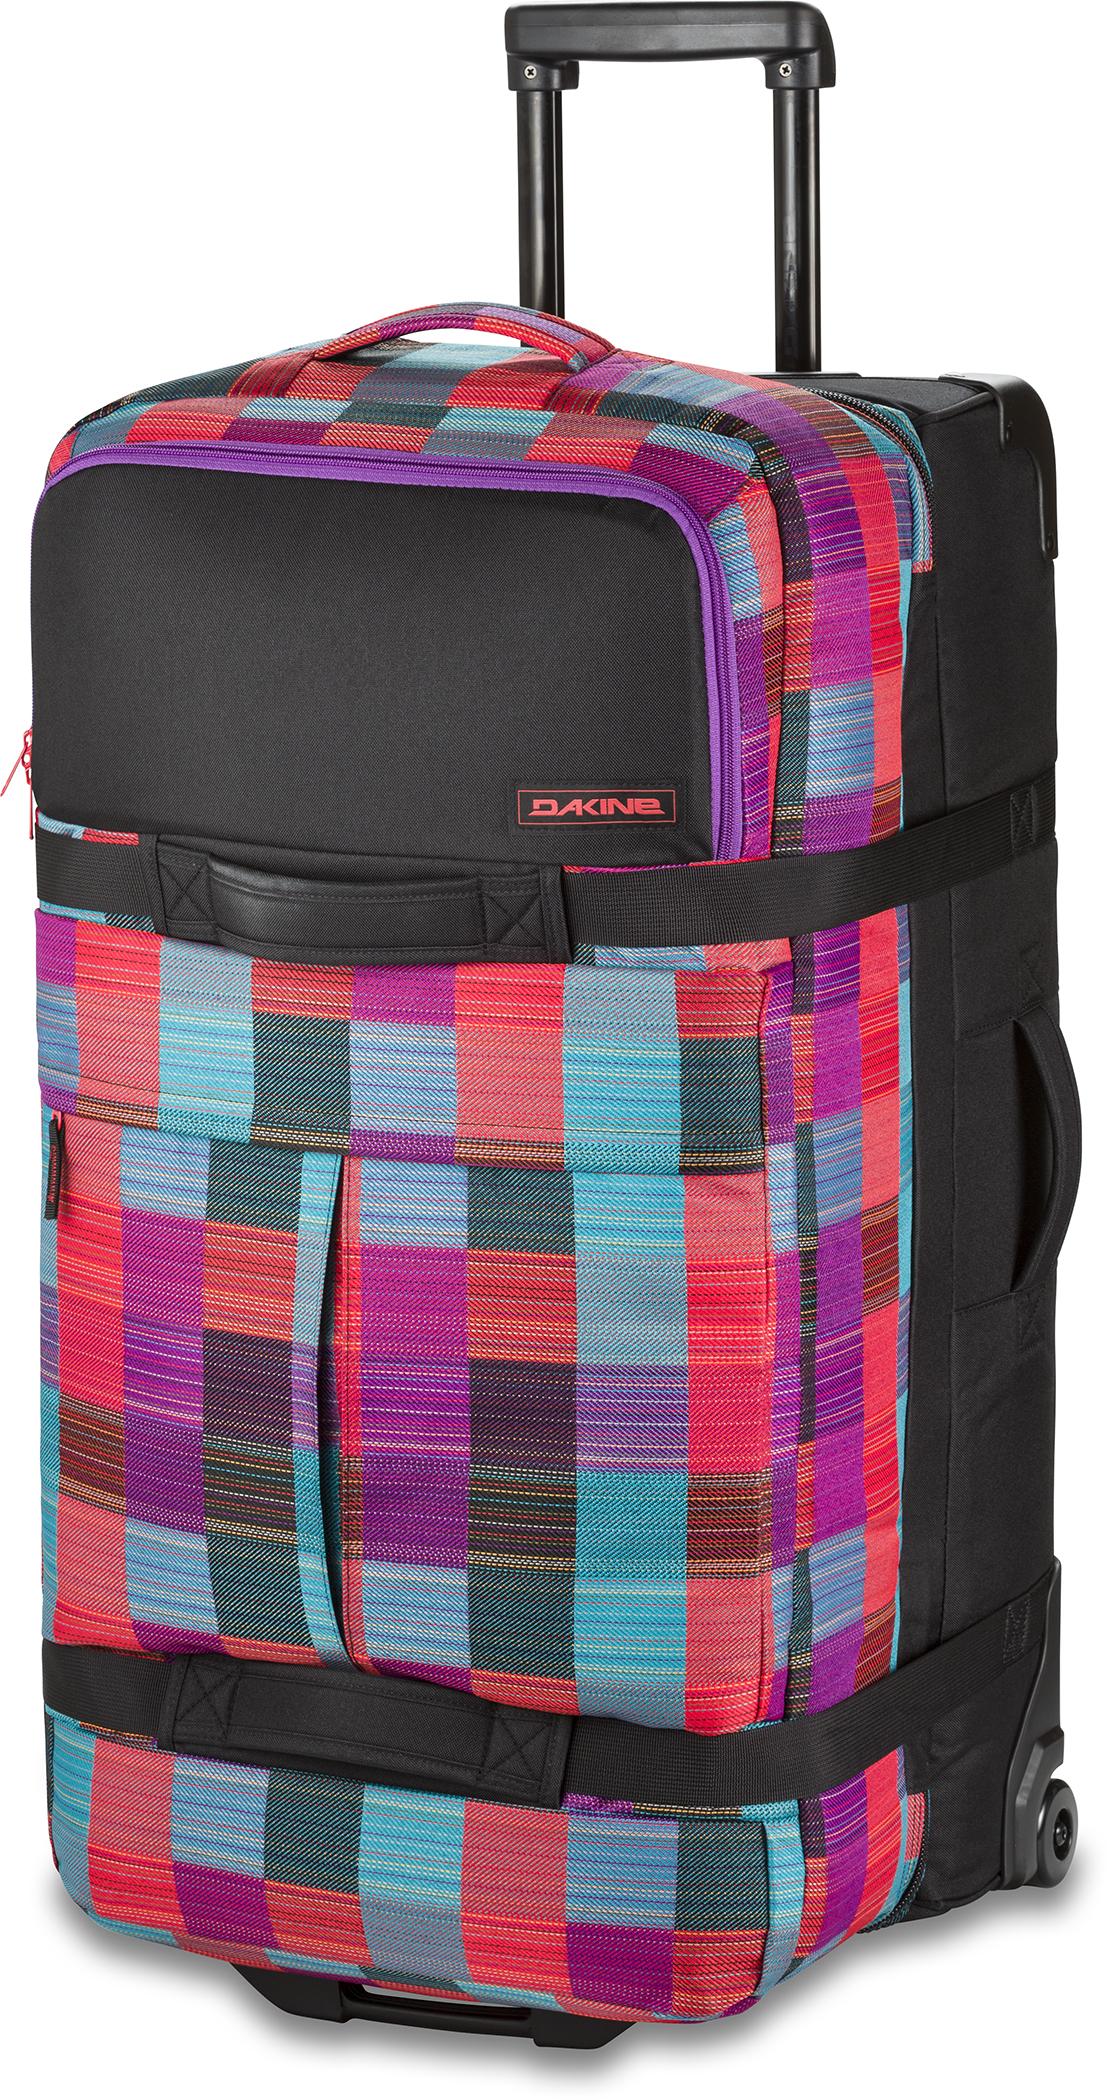 Dakine Luggage - Split Roller 65L - 2016 Layla